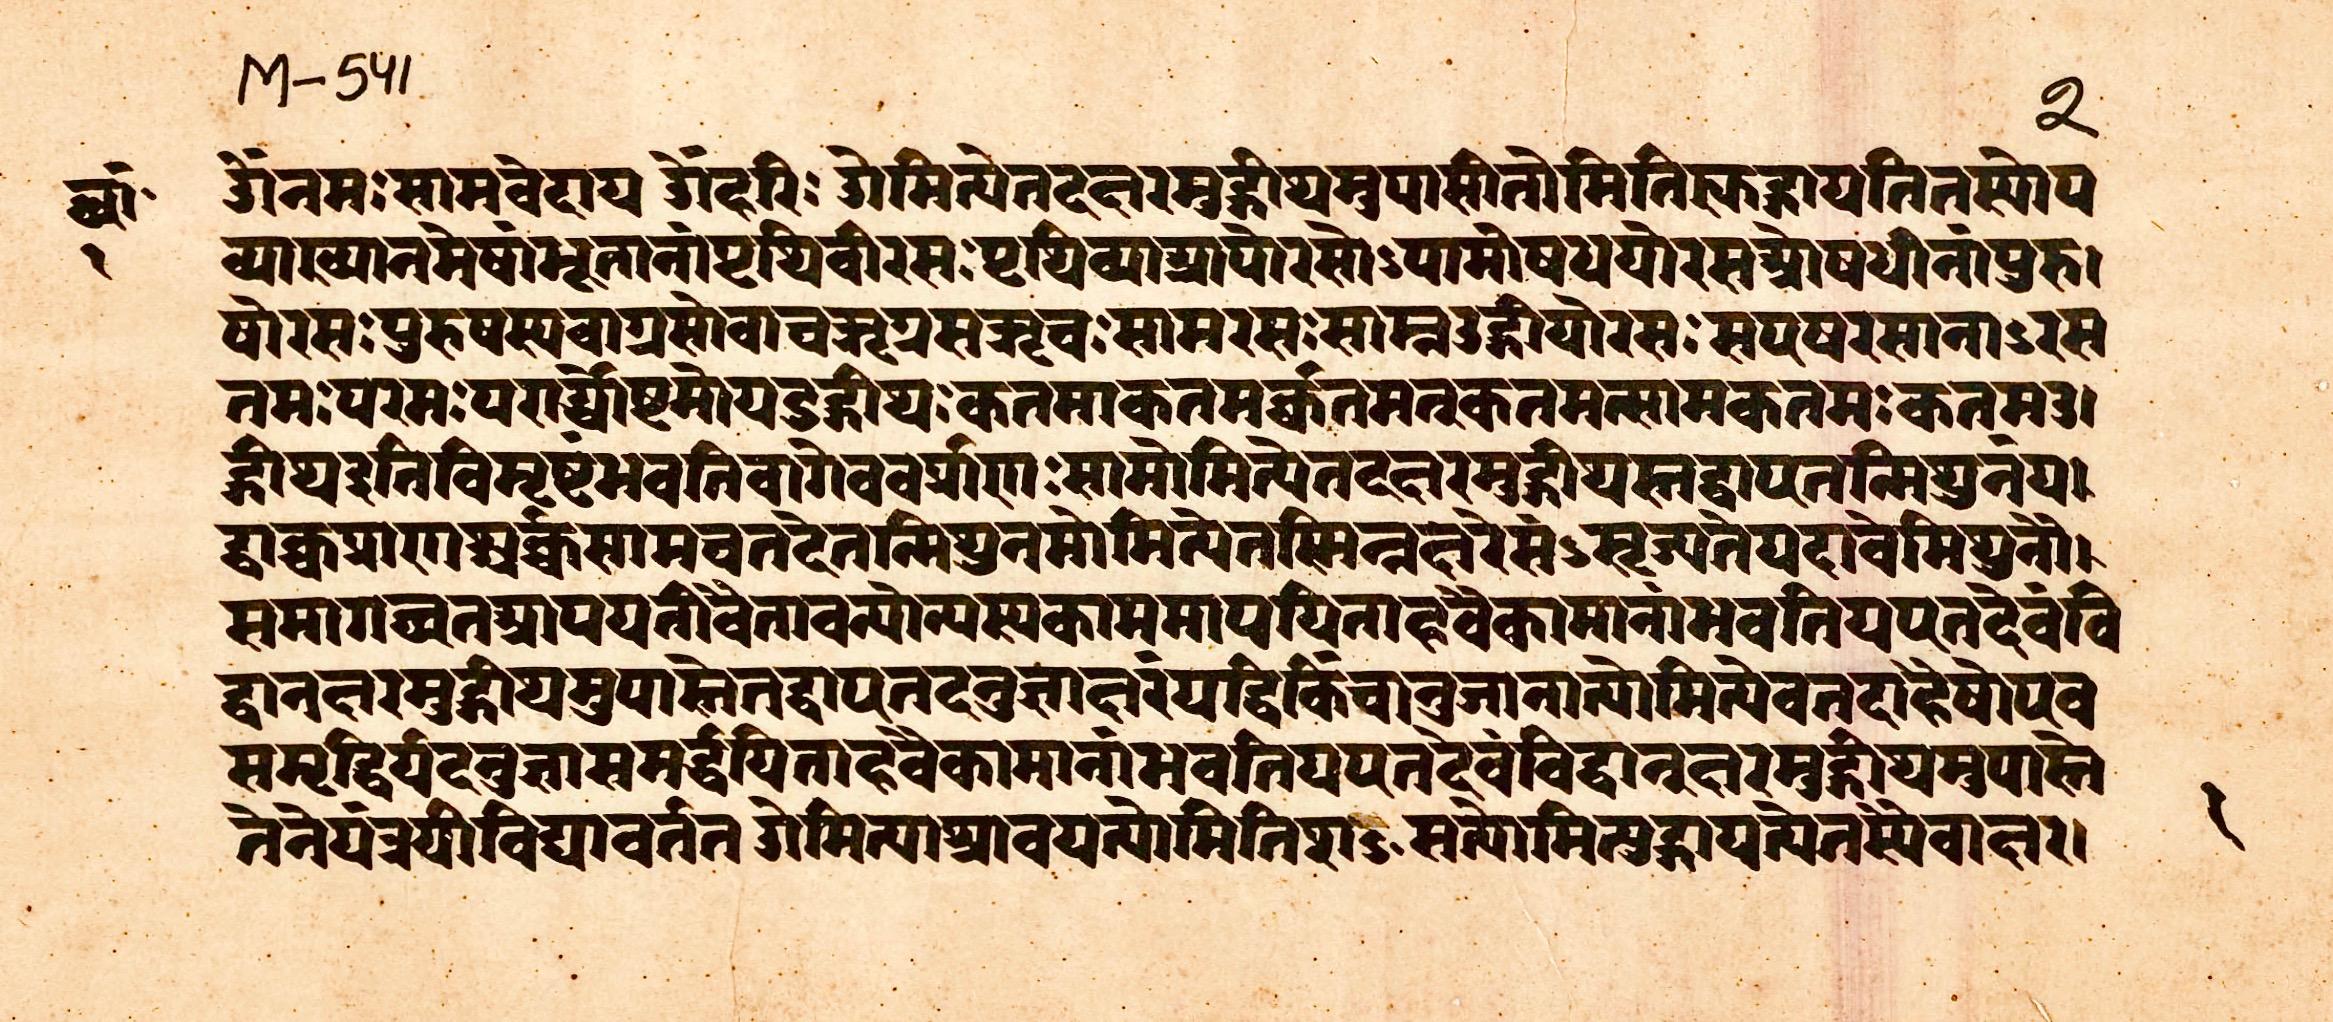 108 Upanishads Malayalam Pdf